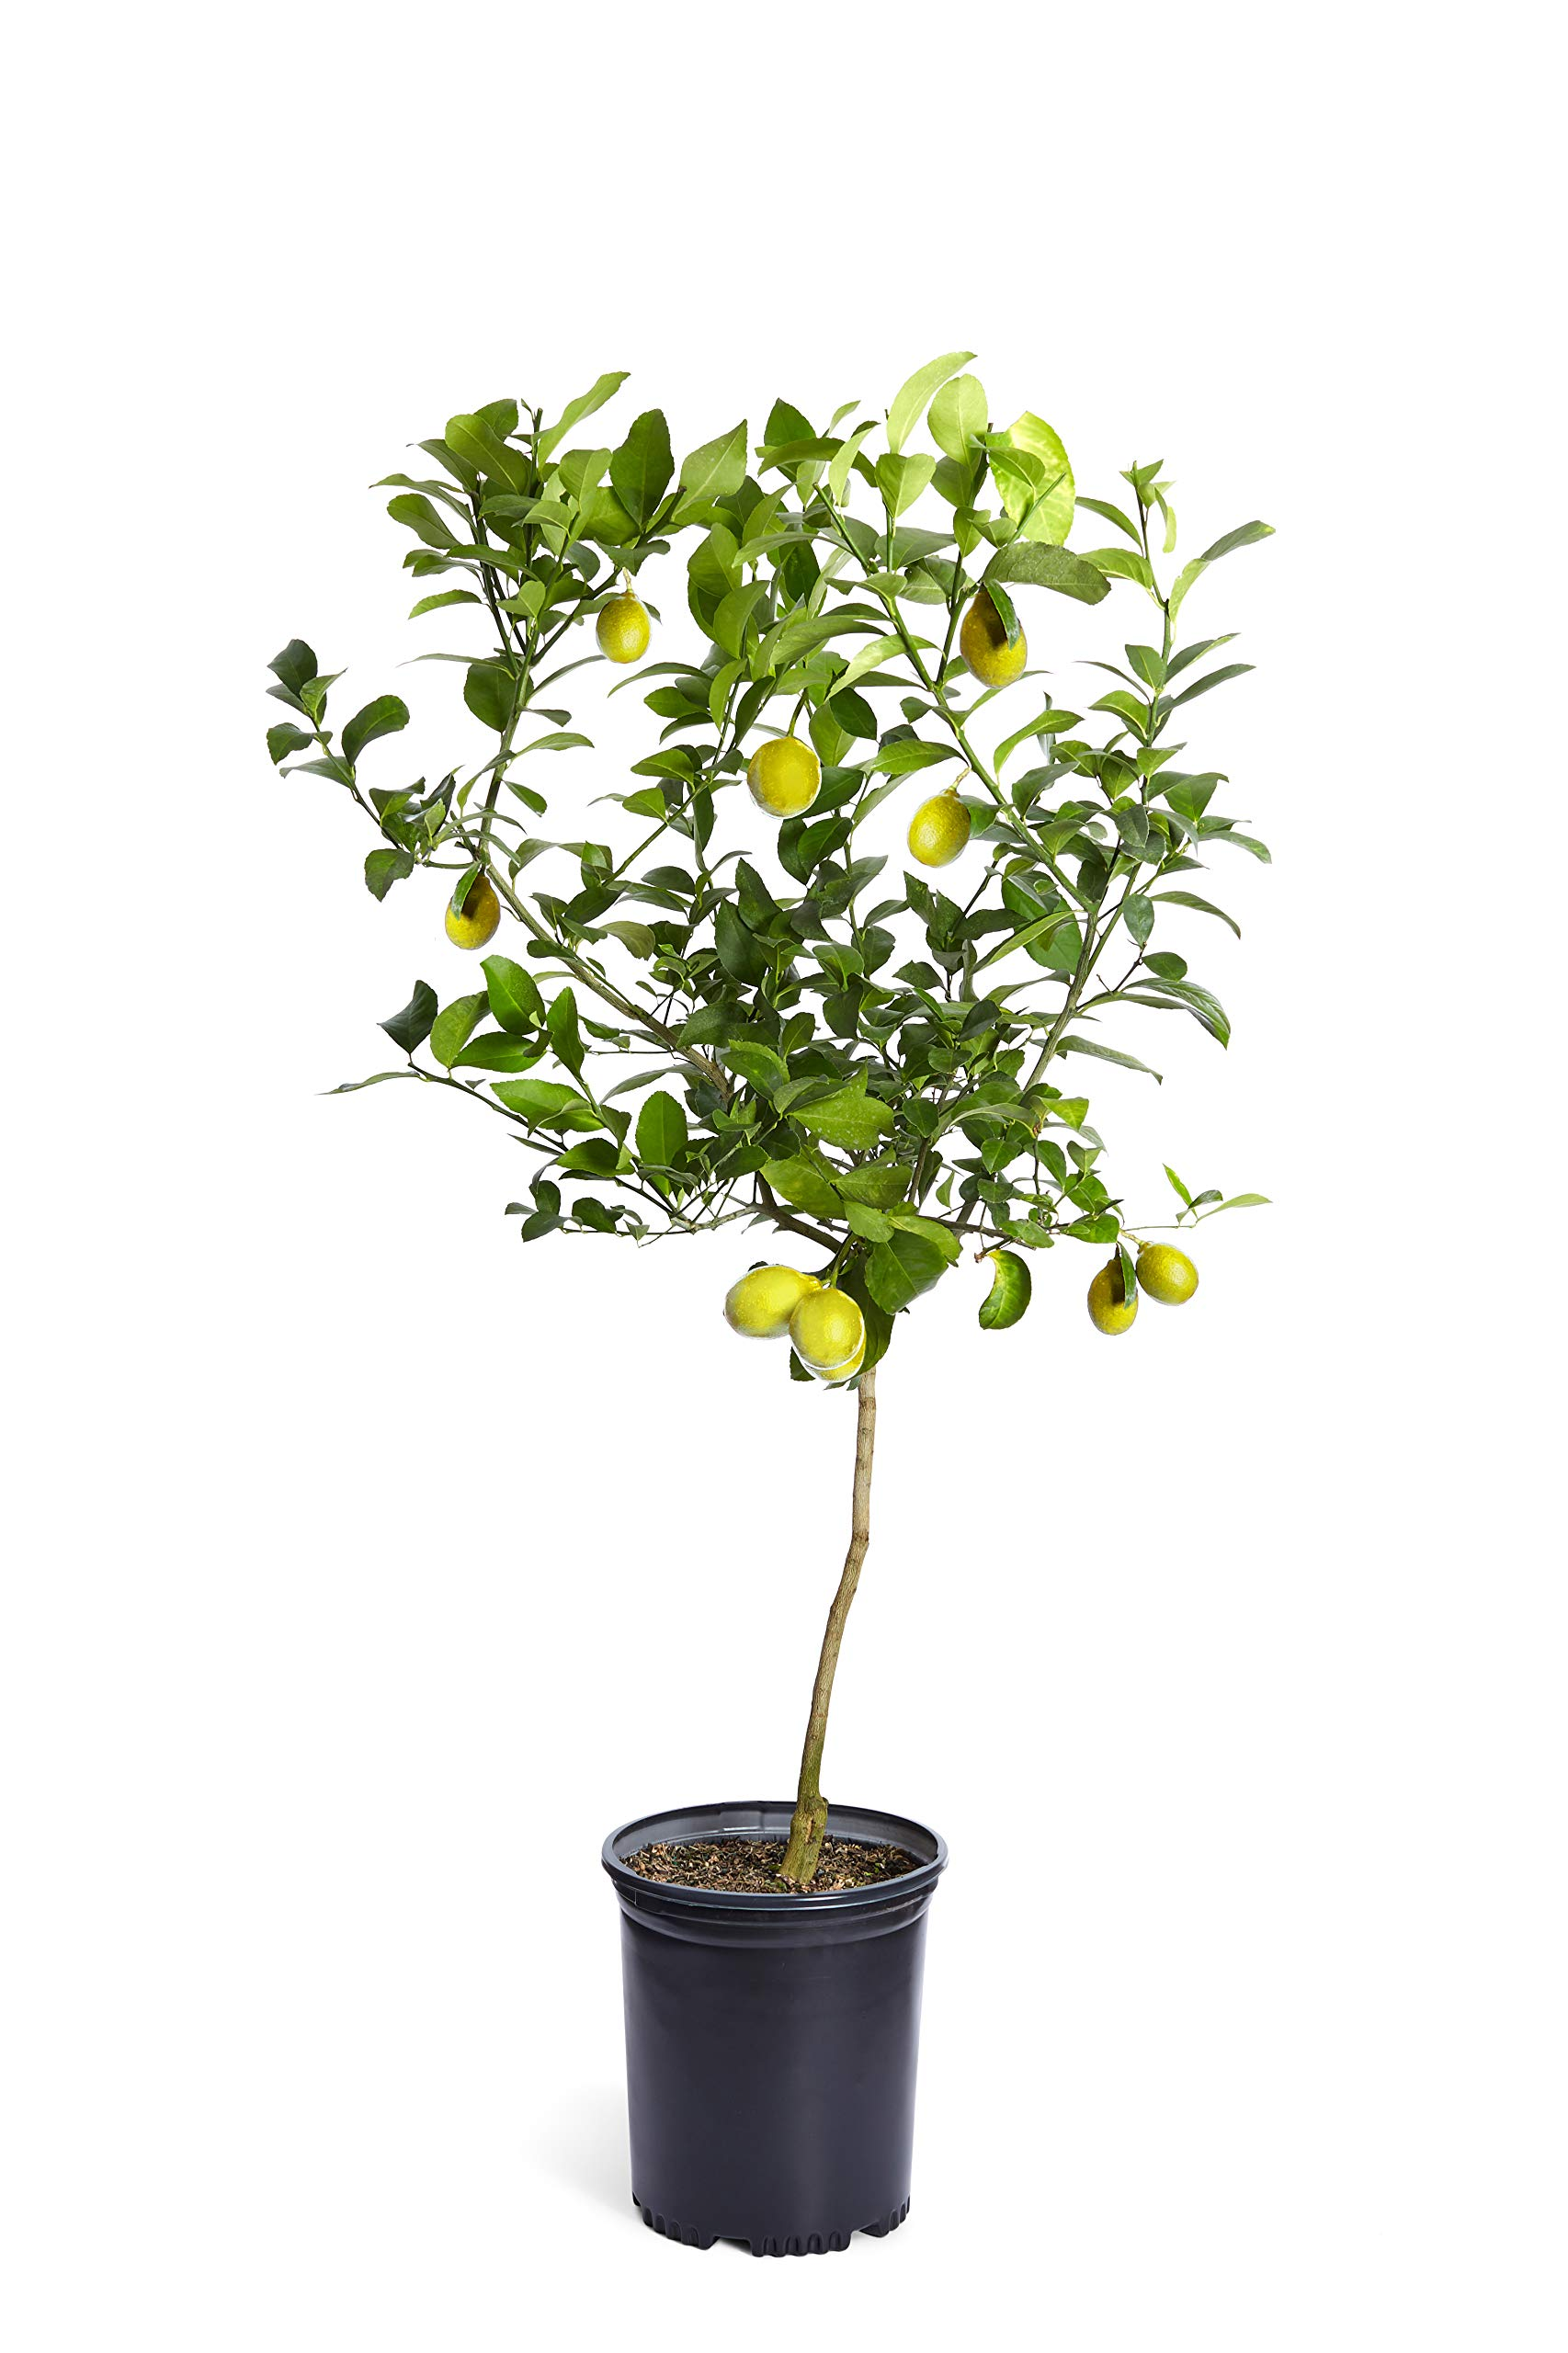 Improved Meyer Lemon Tree- Dwarf Fruit Trees - Indoor/Outdoor Live Potted Citrus Tree - 3-4 ft. - Cannot Ship to FL, CA, TX, LA or AZ